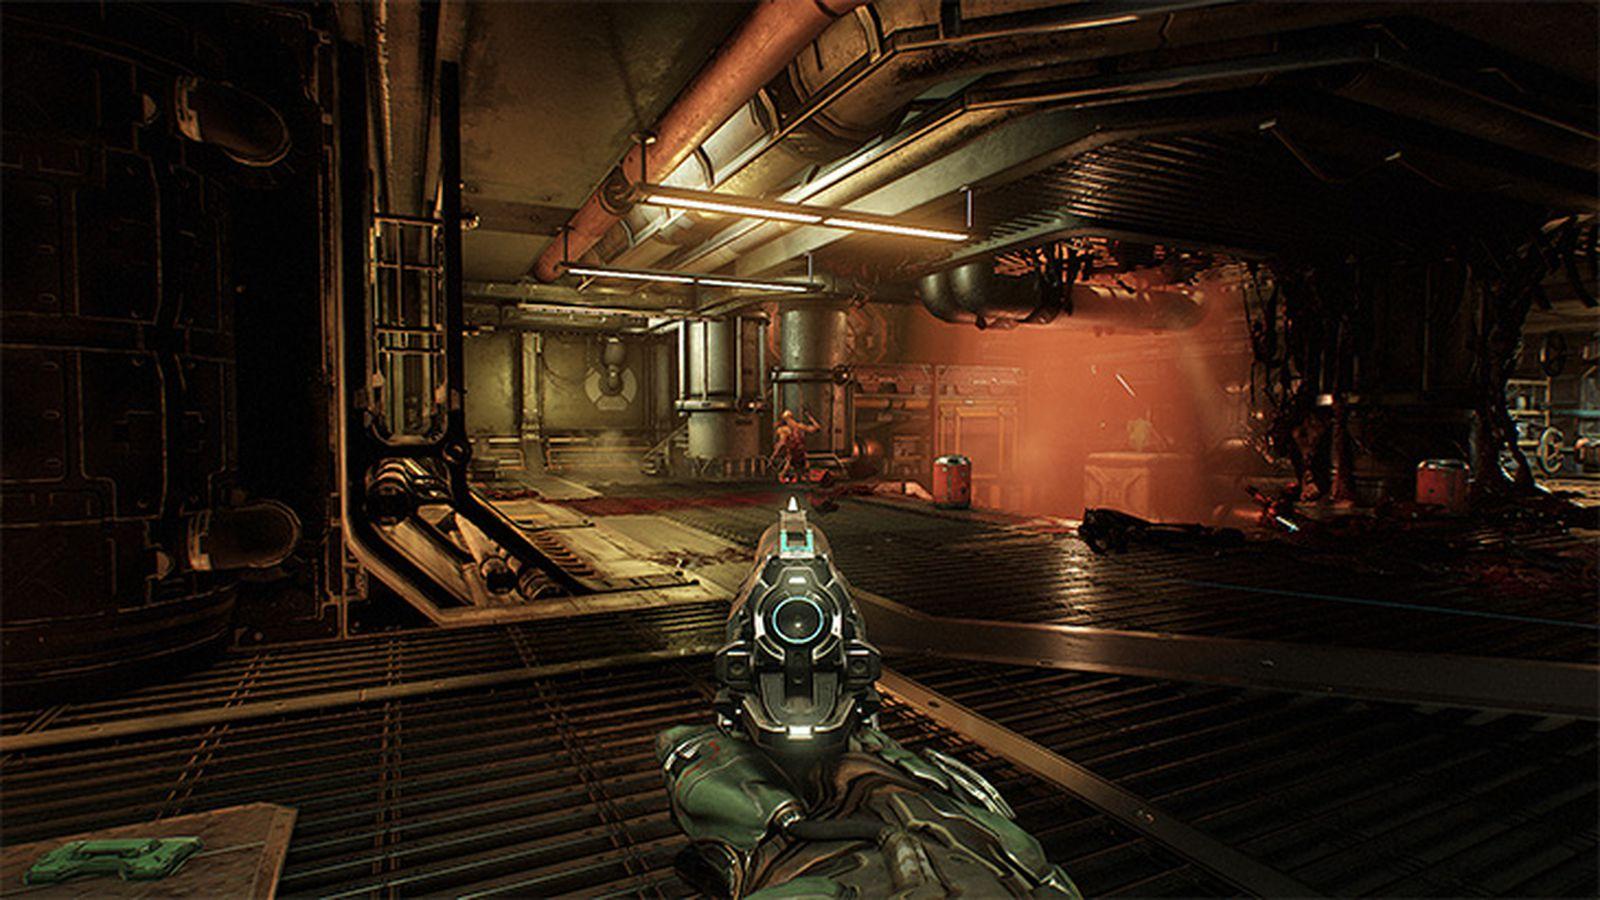 Doom update adds photo mode this week | Polygon